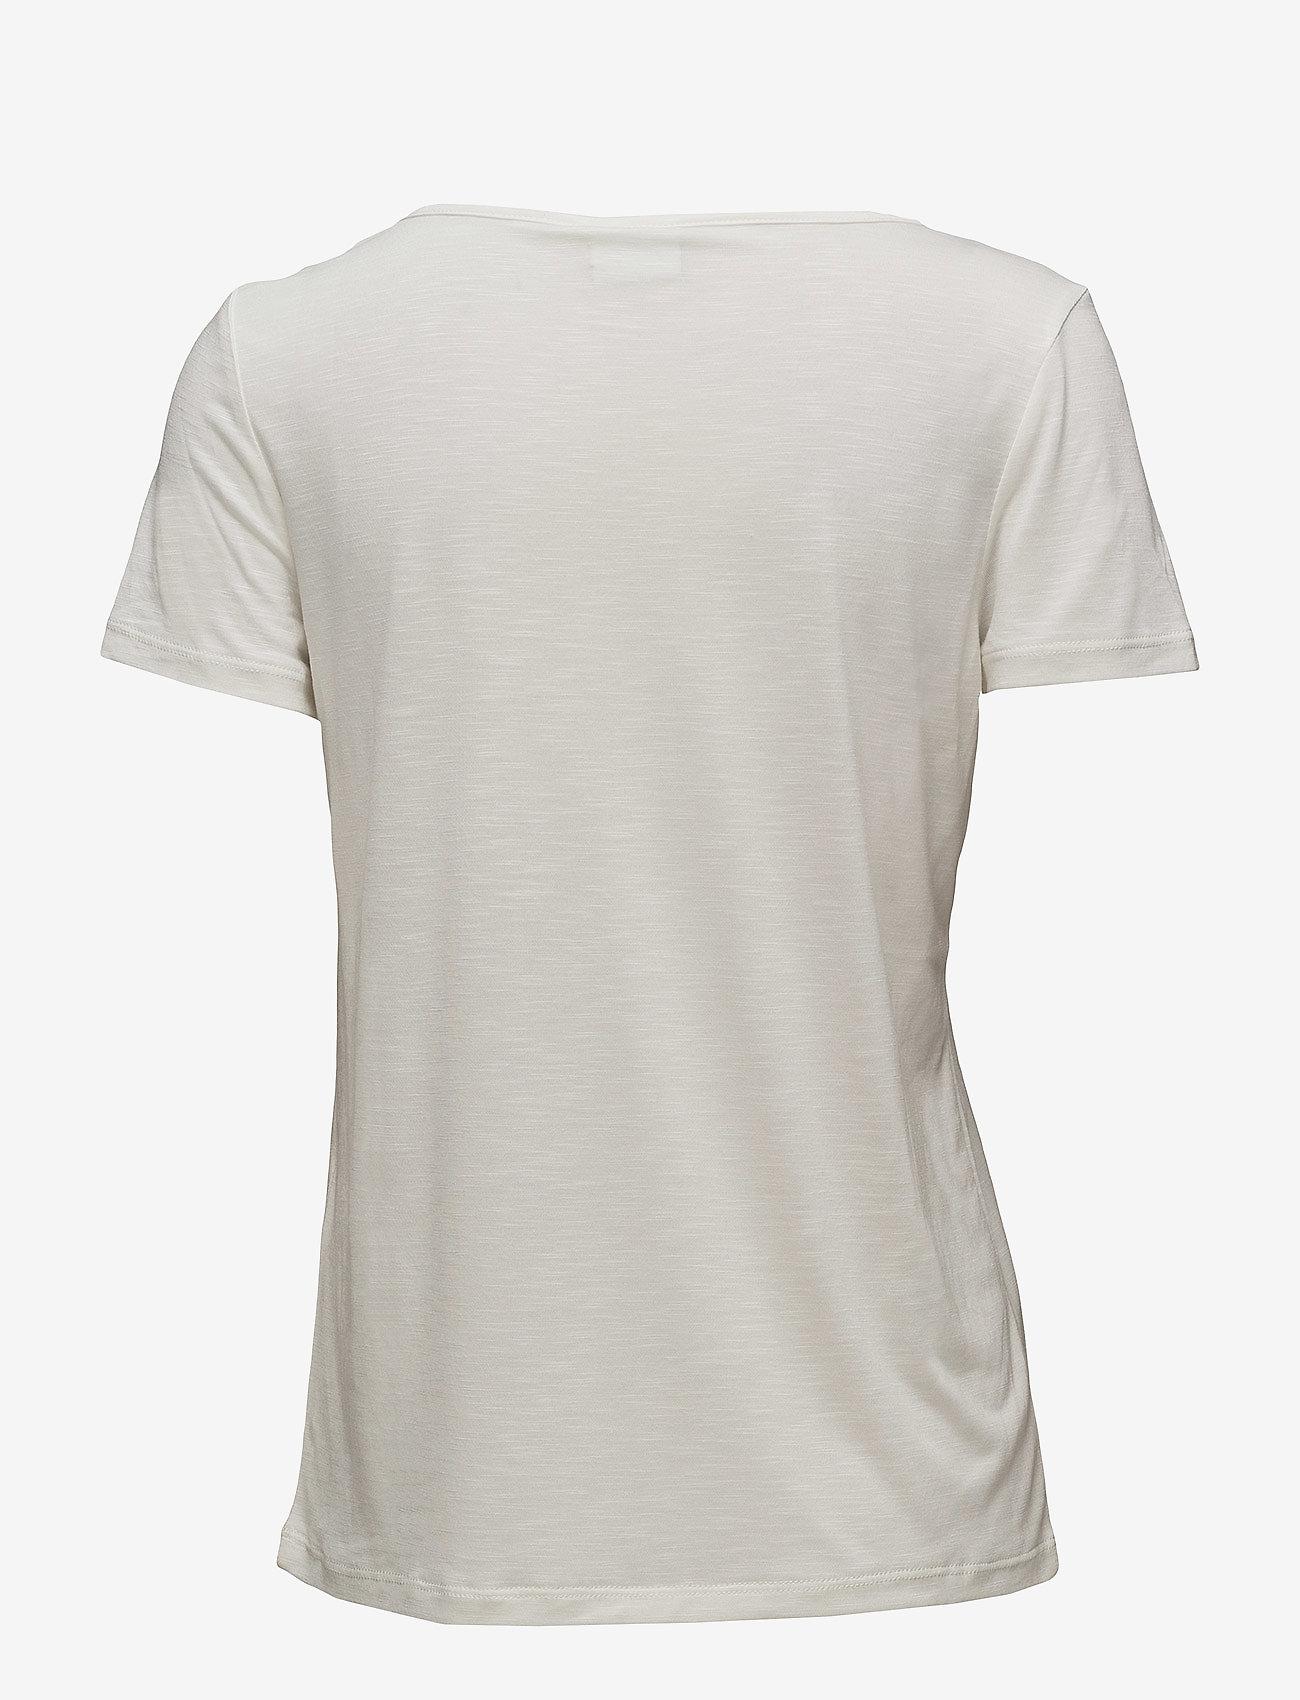 Vinoel S/s V-neck T-shirt-noos (Cloud Dancer) (13.59 €) - Vila suvEA